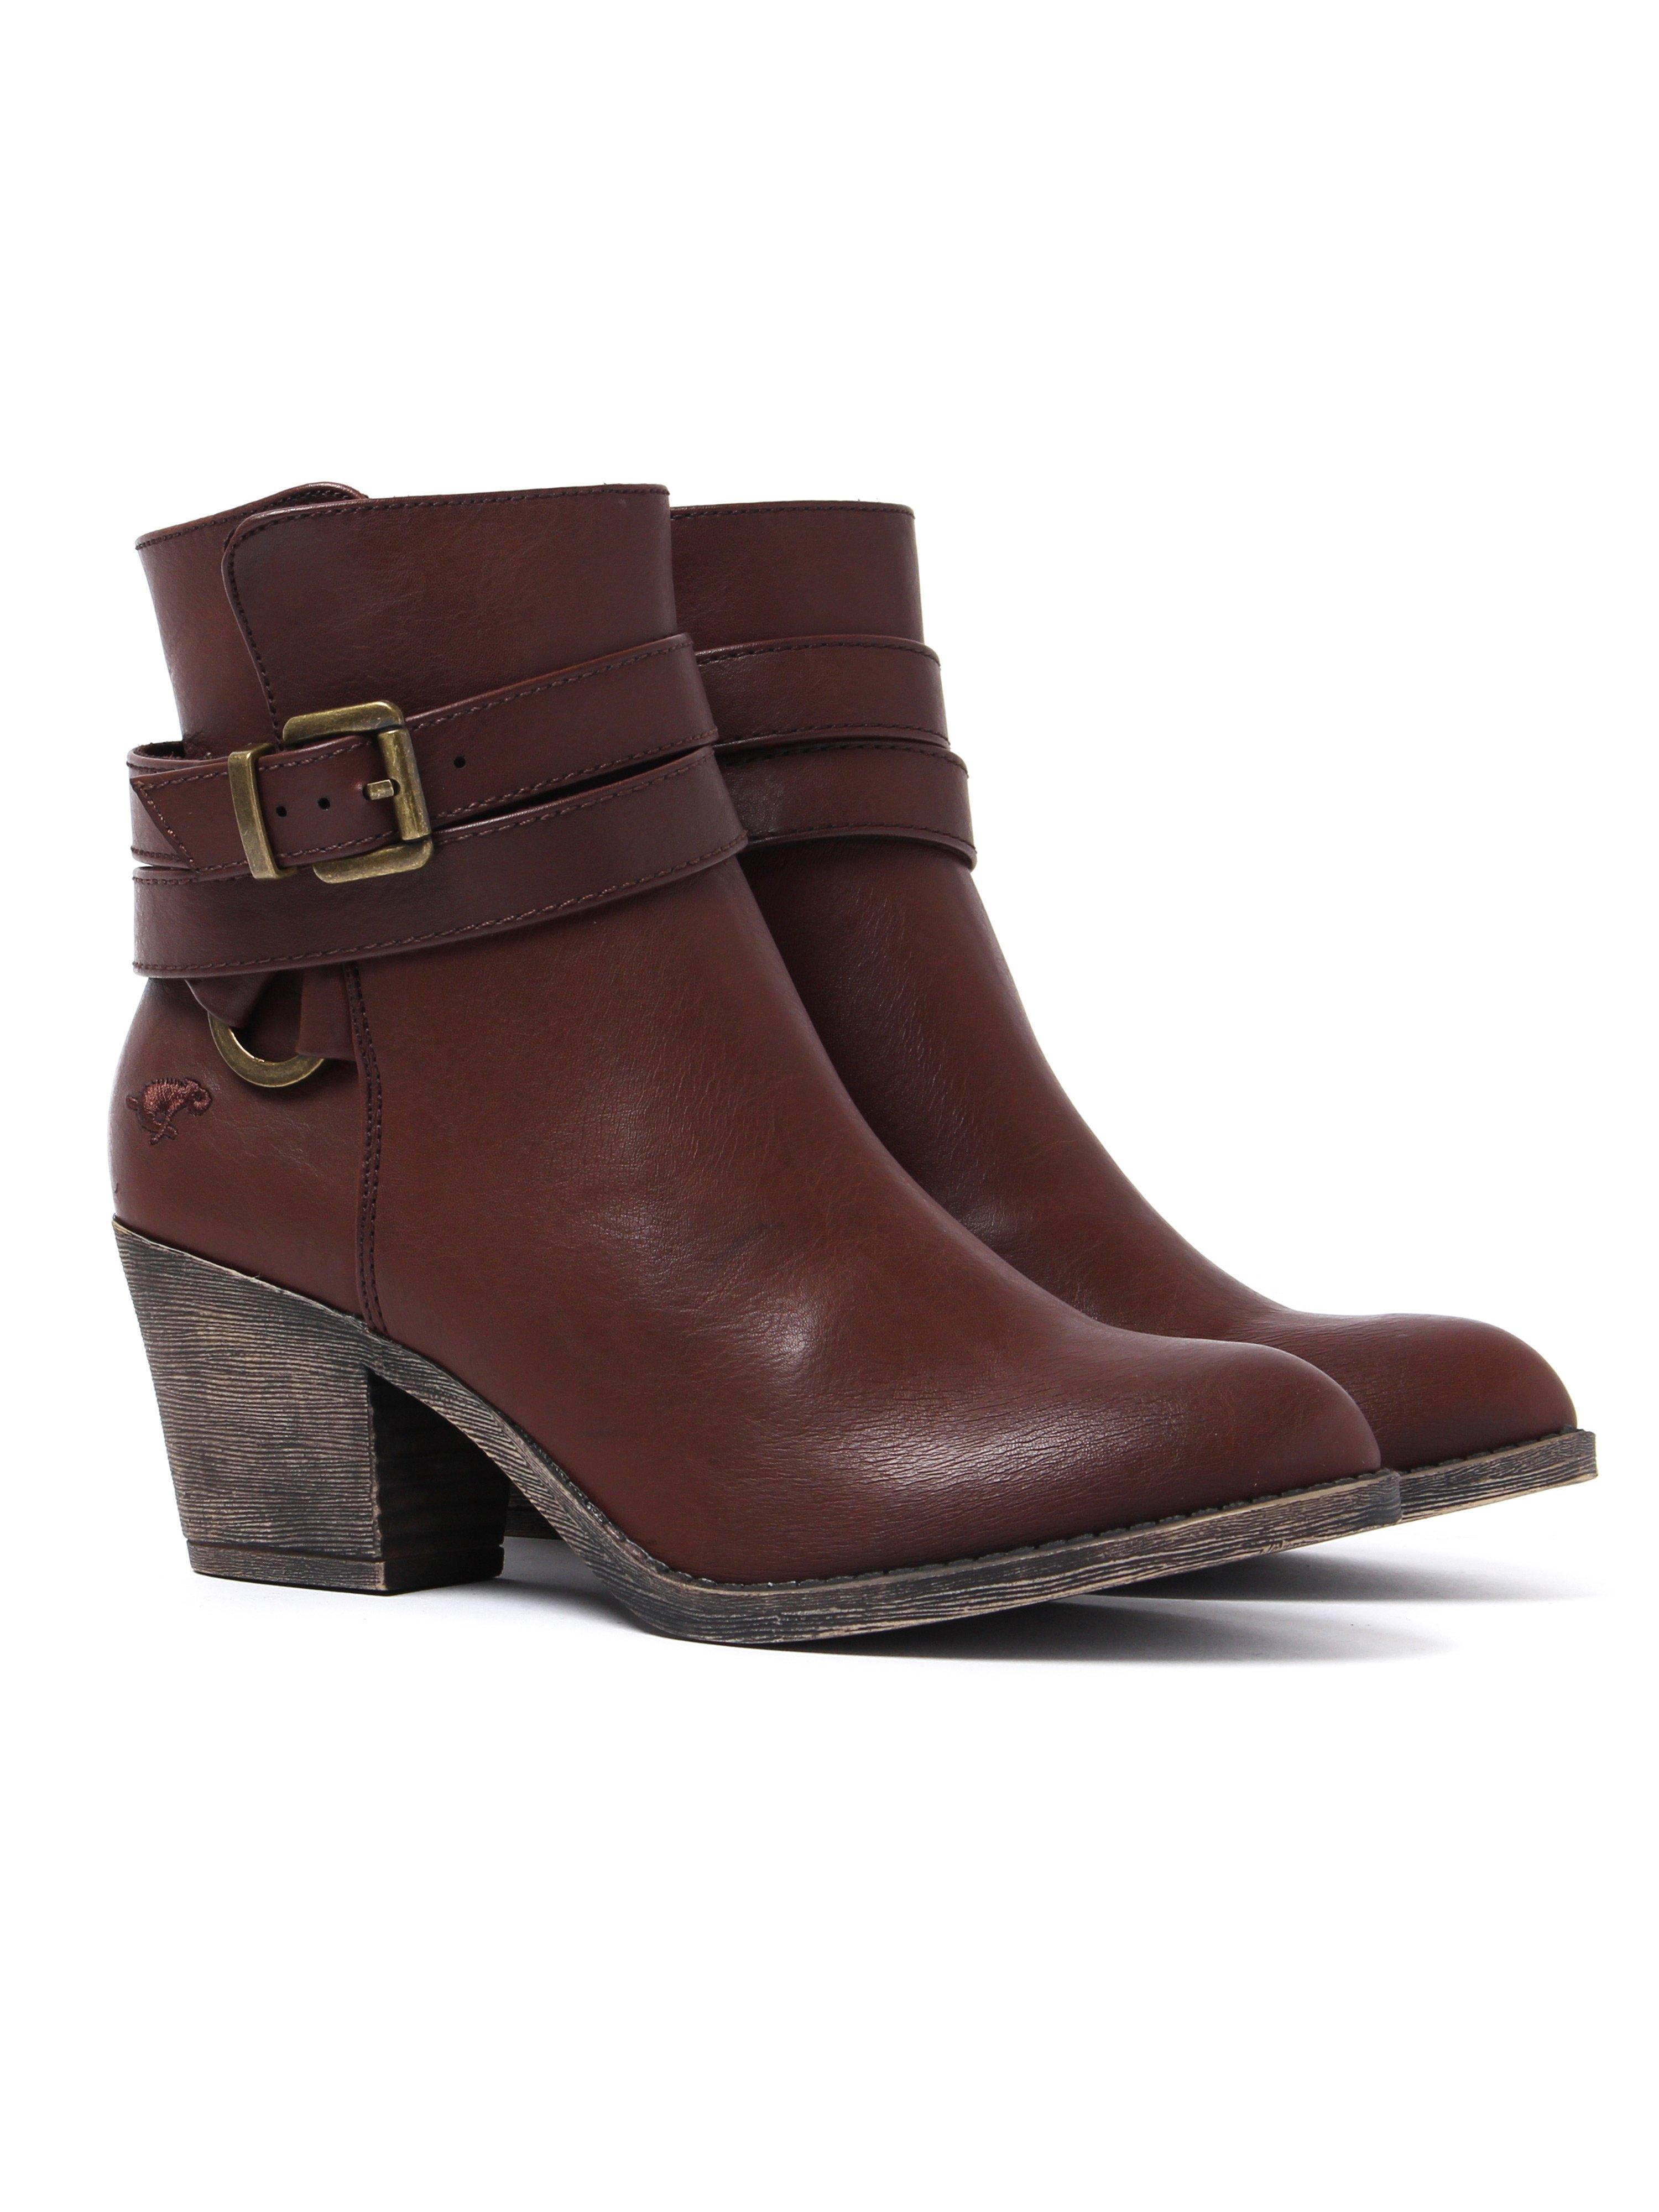 Rocket Dog Women's Salvador Autumn Heeled Boots - Dark Brown